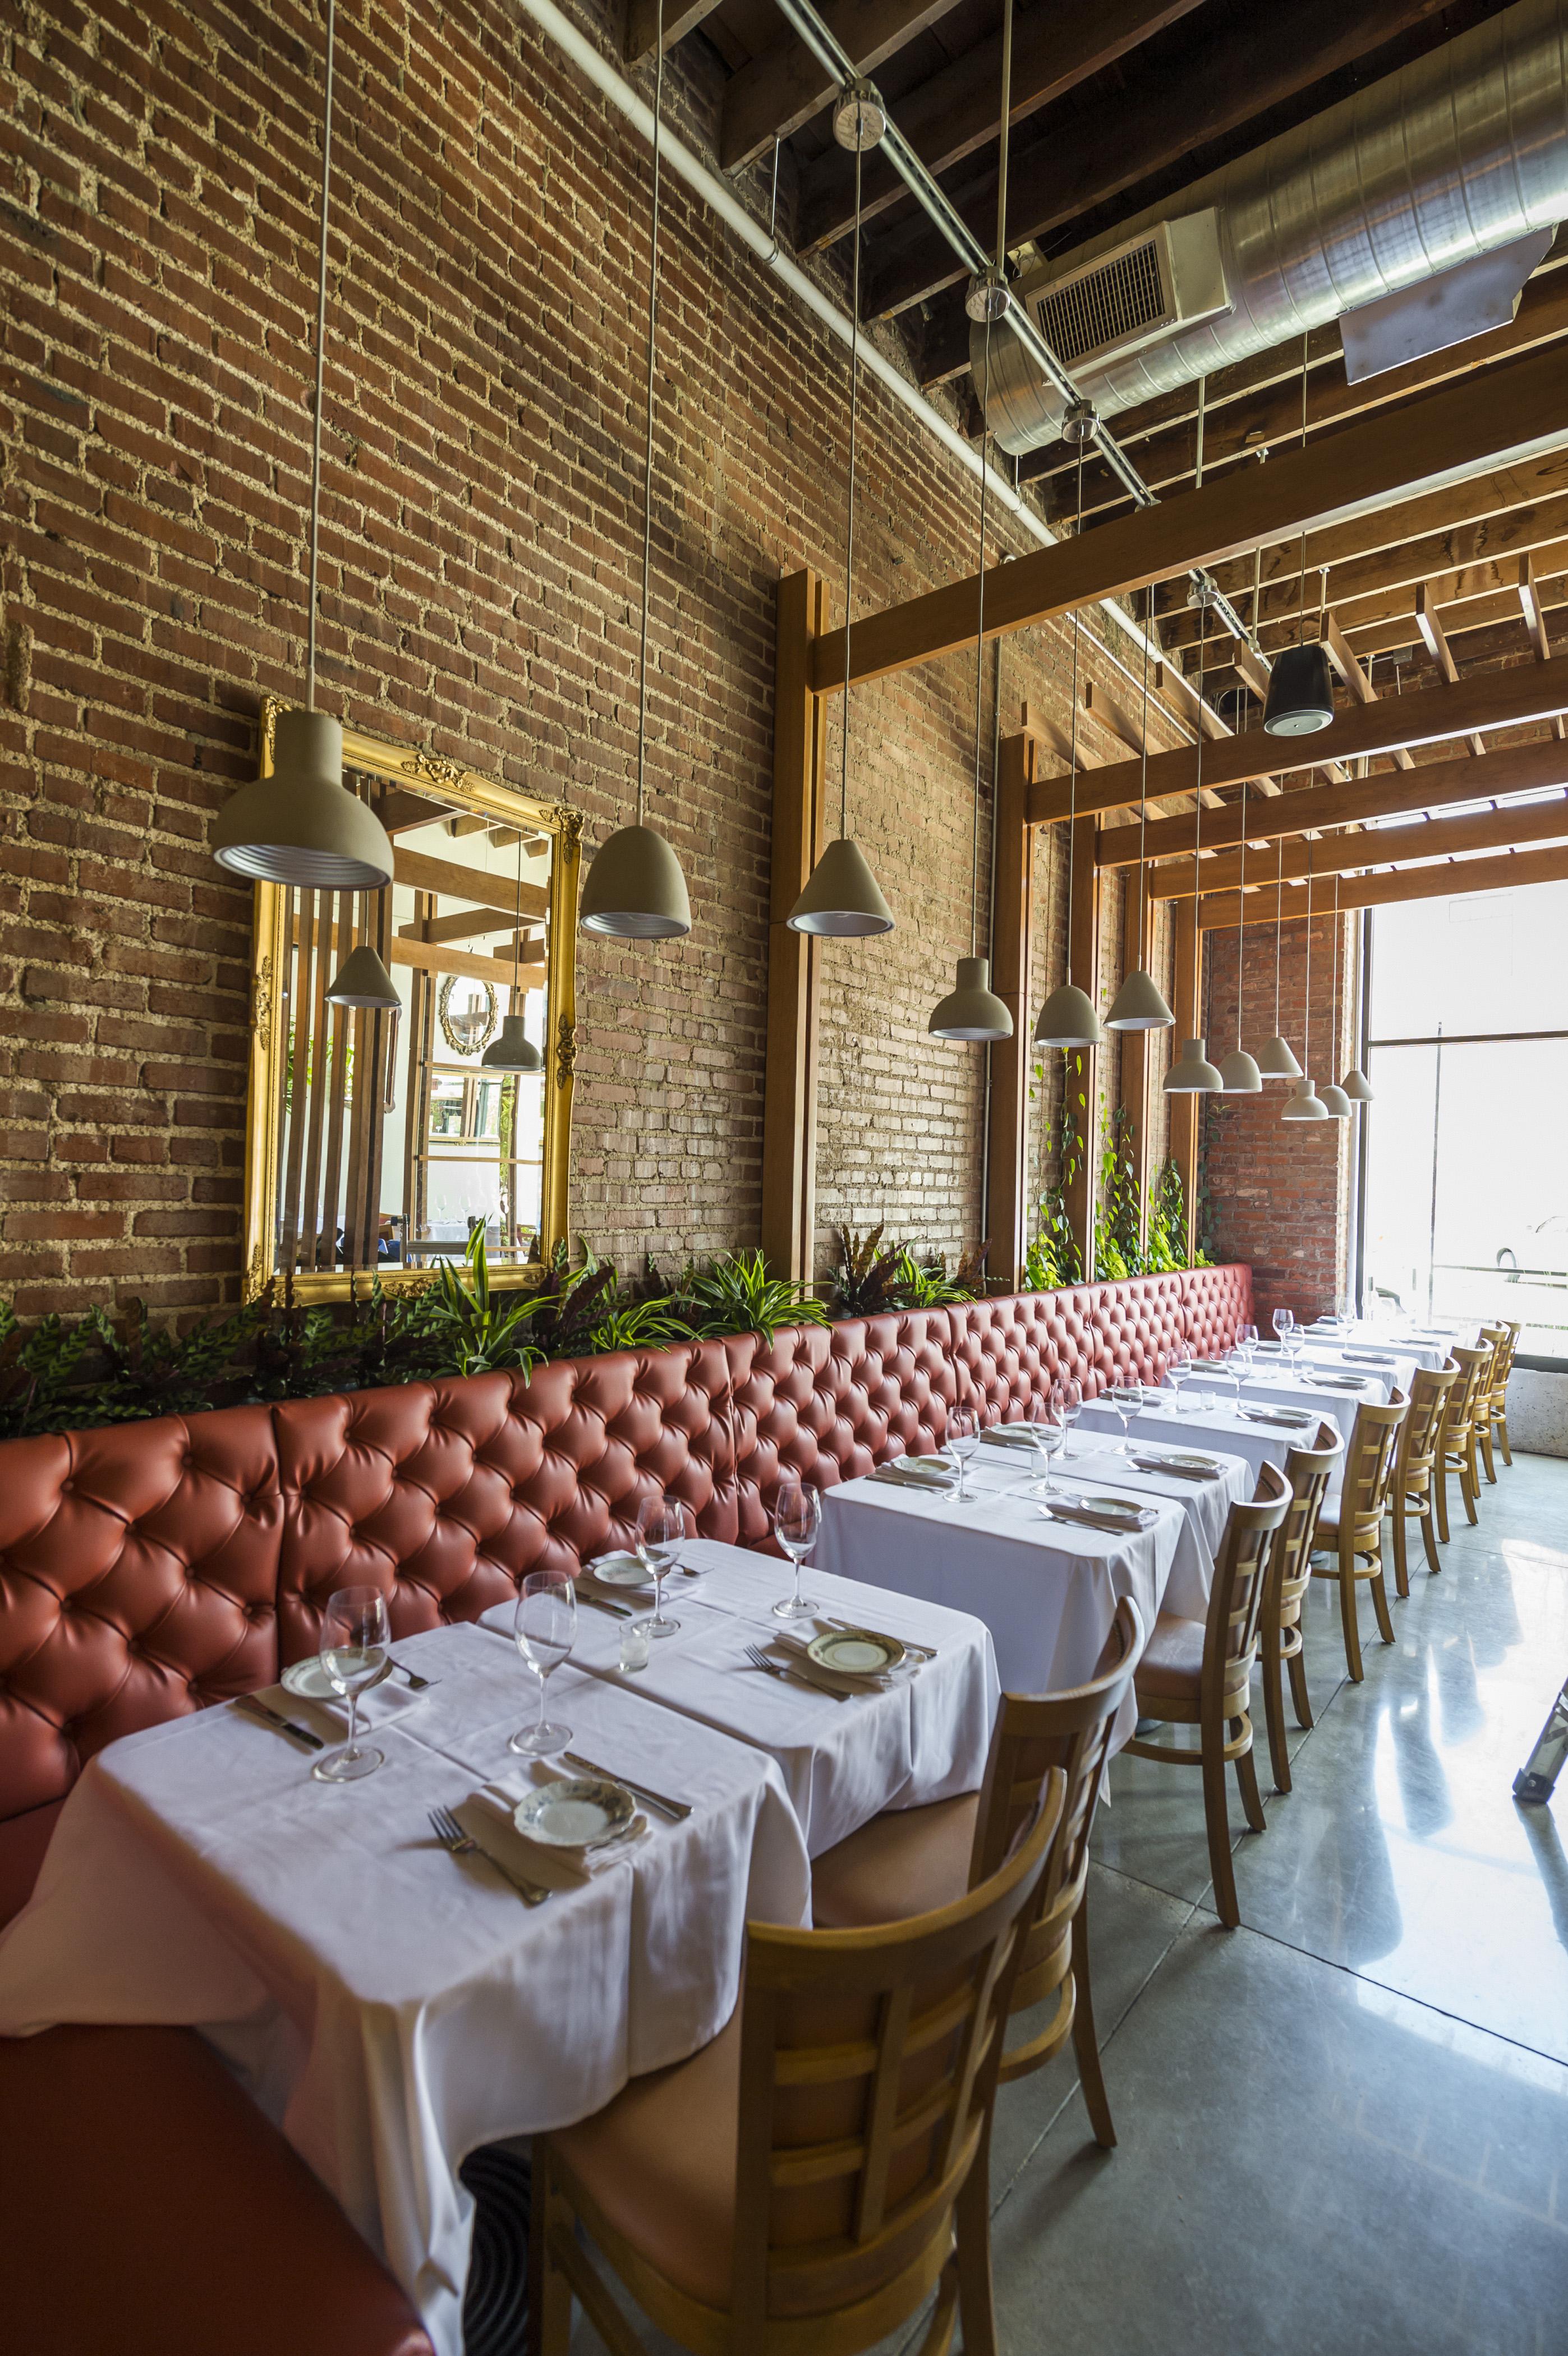 06 12 2017 Amelia's restaurant SILO EC0048